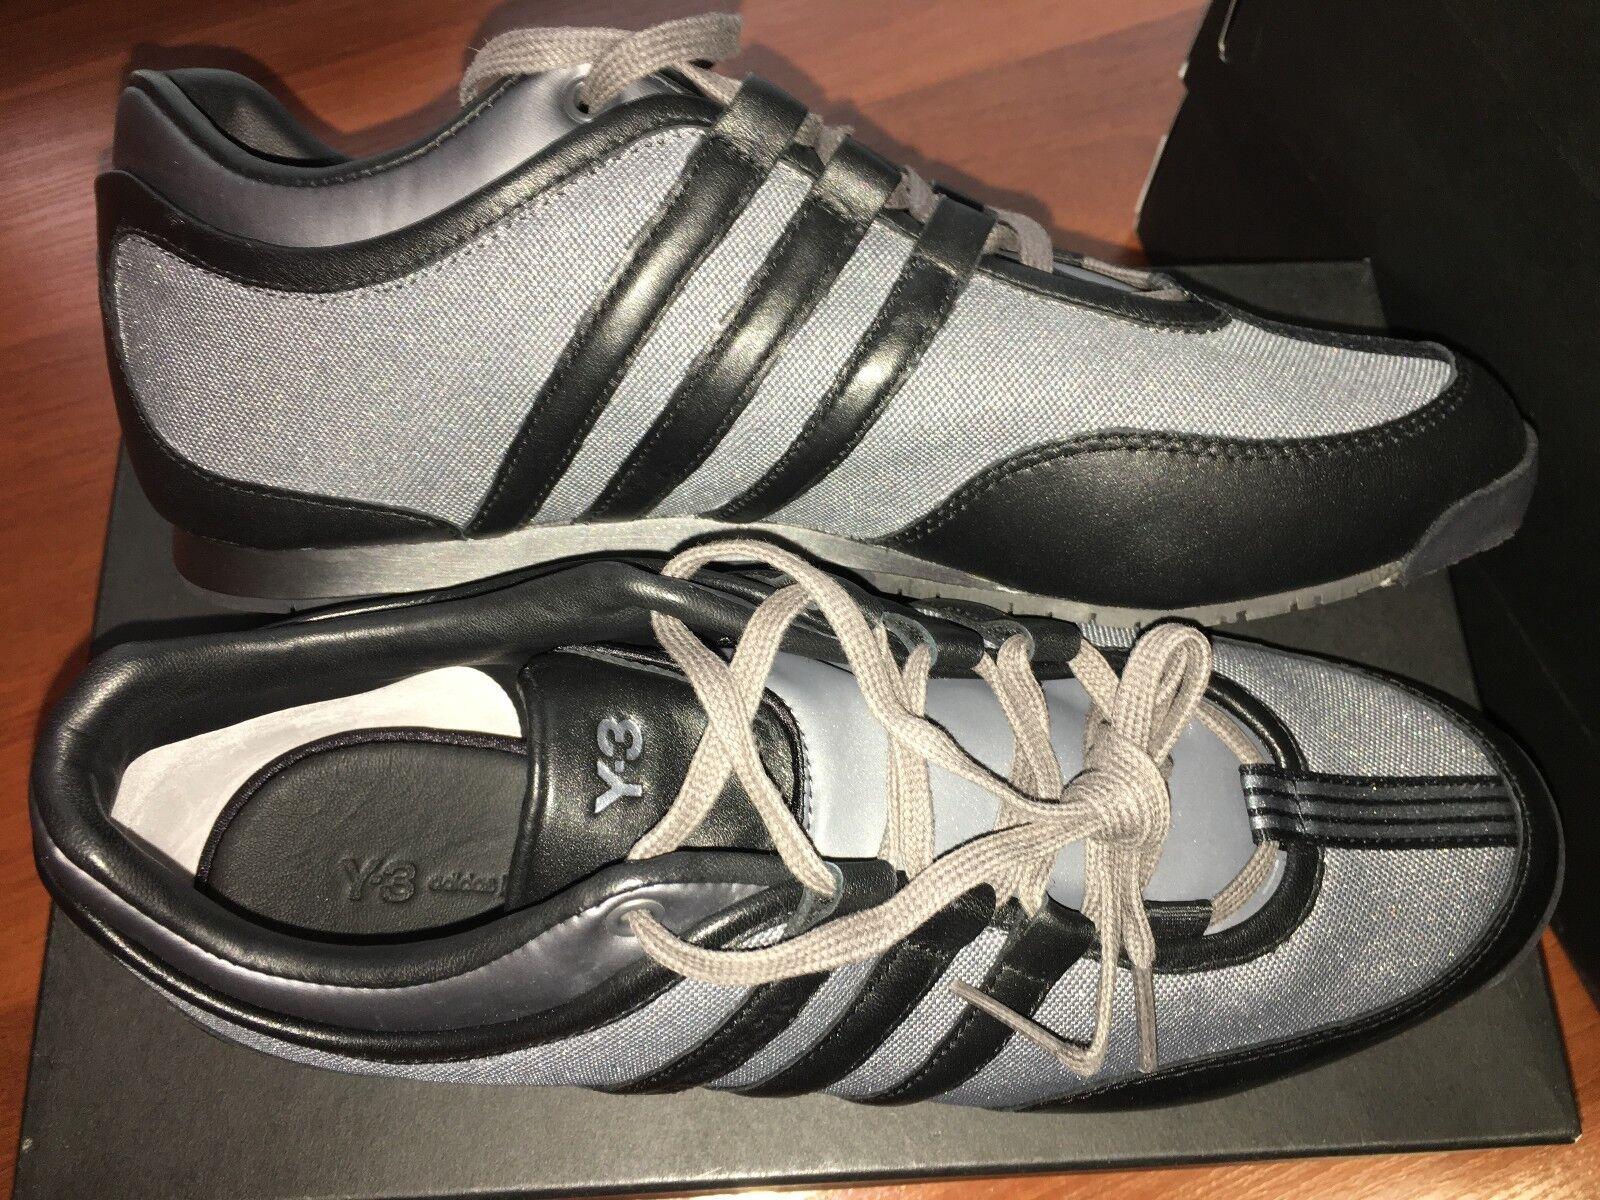 Adidas y-3 bb4720 yohji yamamoto box - trainer schwarz metallic bb4720 y-3 nacht grau selten 216265